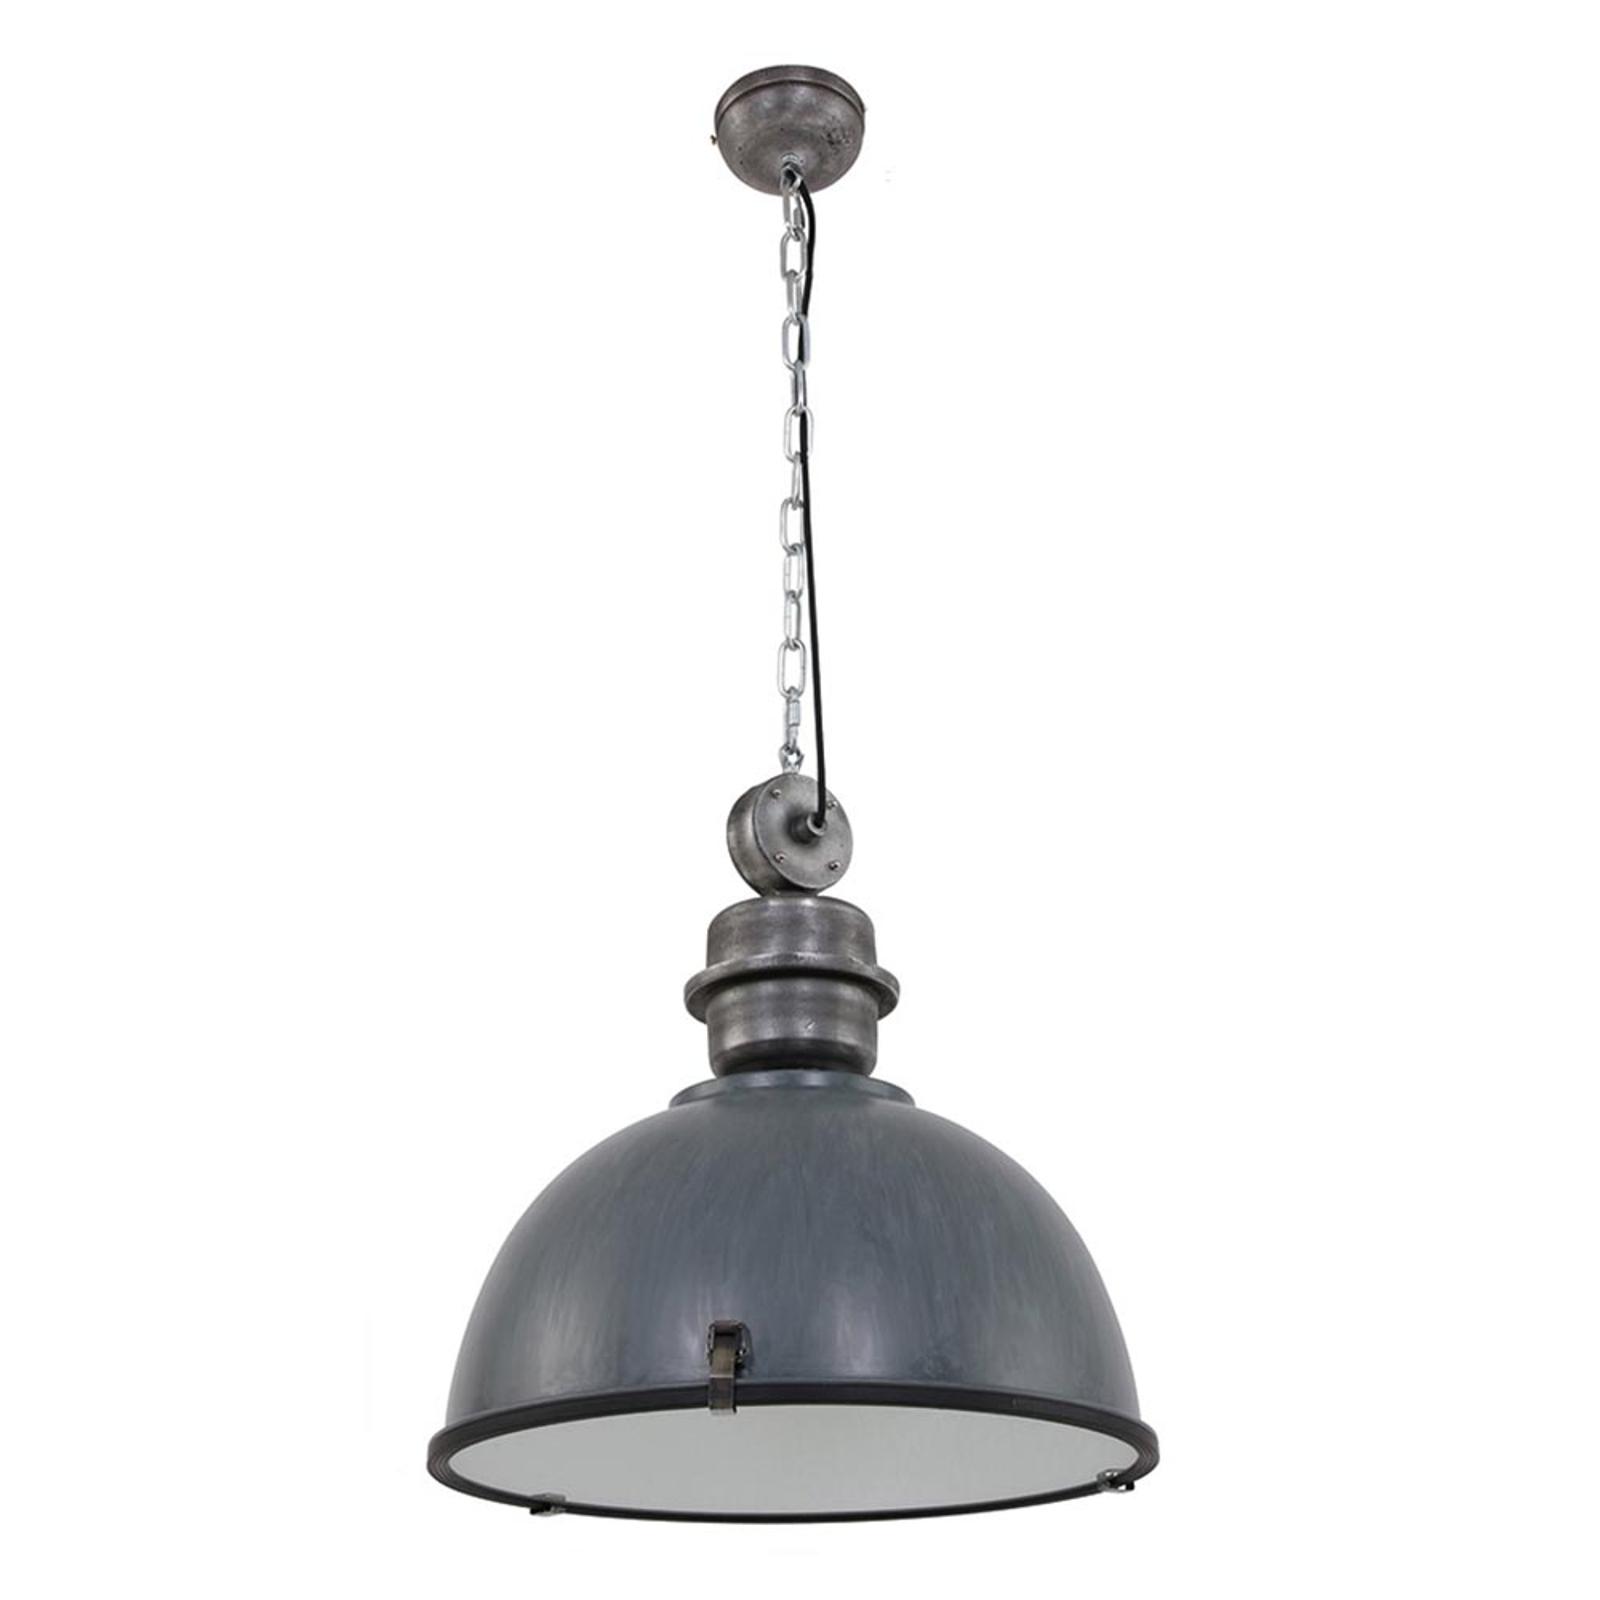 Suspension grise Bikkel XXL en design industriel